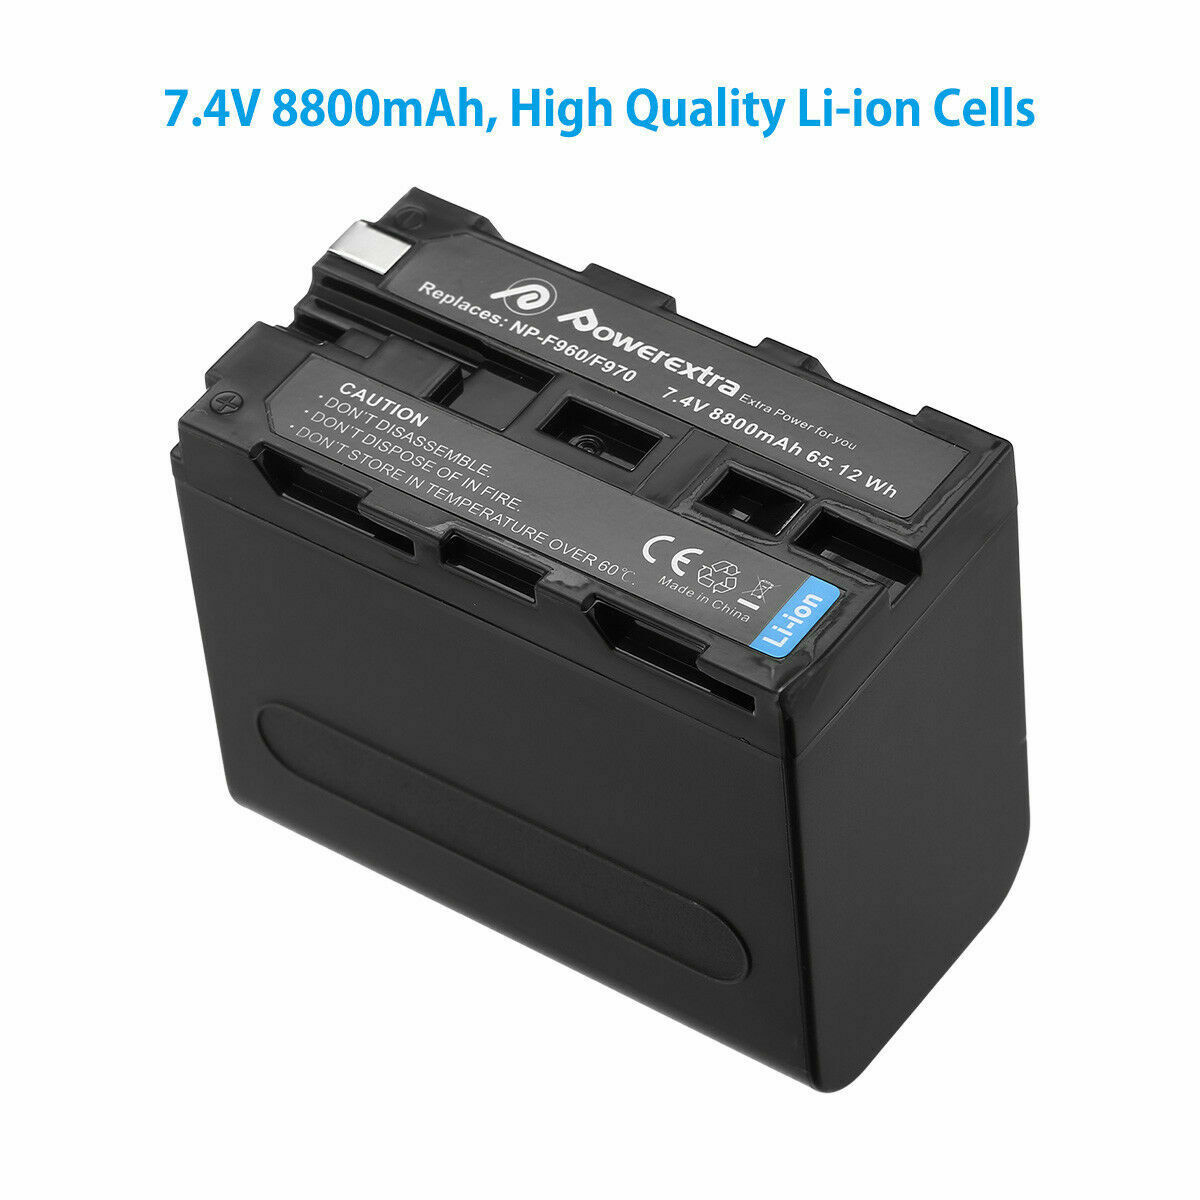 Bateria 10400mah cargador para Sony np-f-750 f-950 f-960